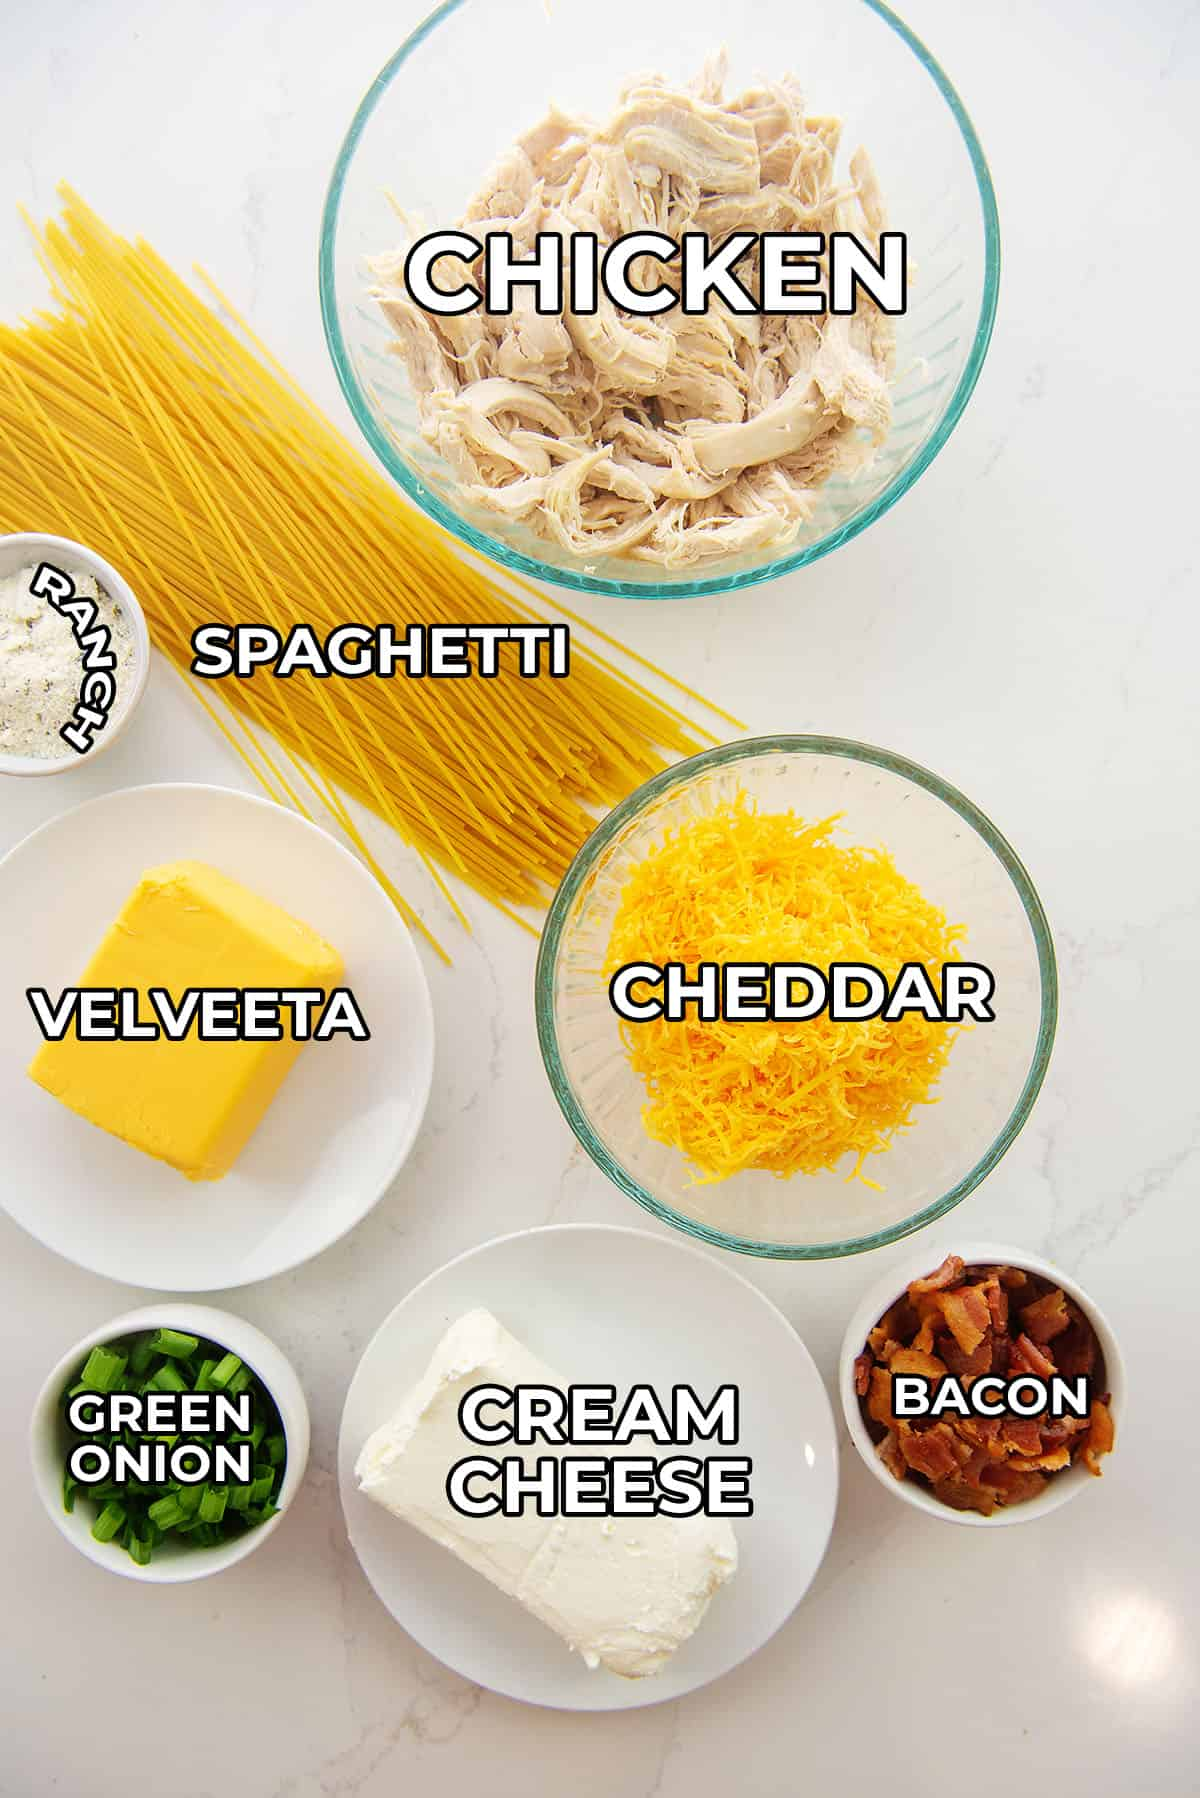 ingredients for crack chicken spaghetti.